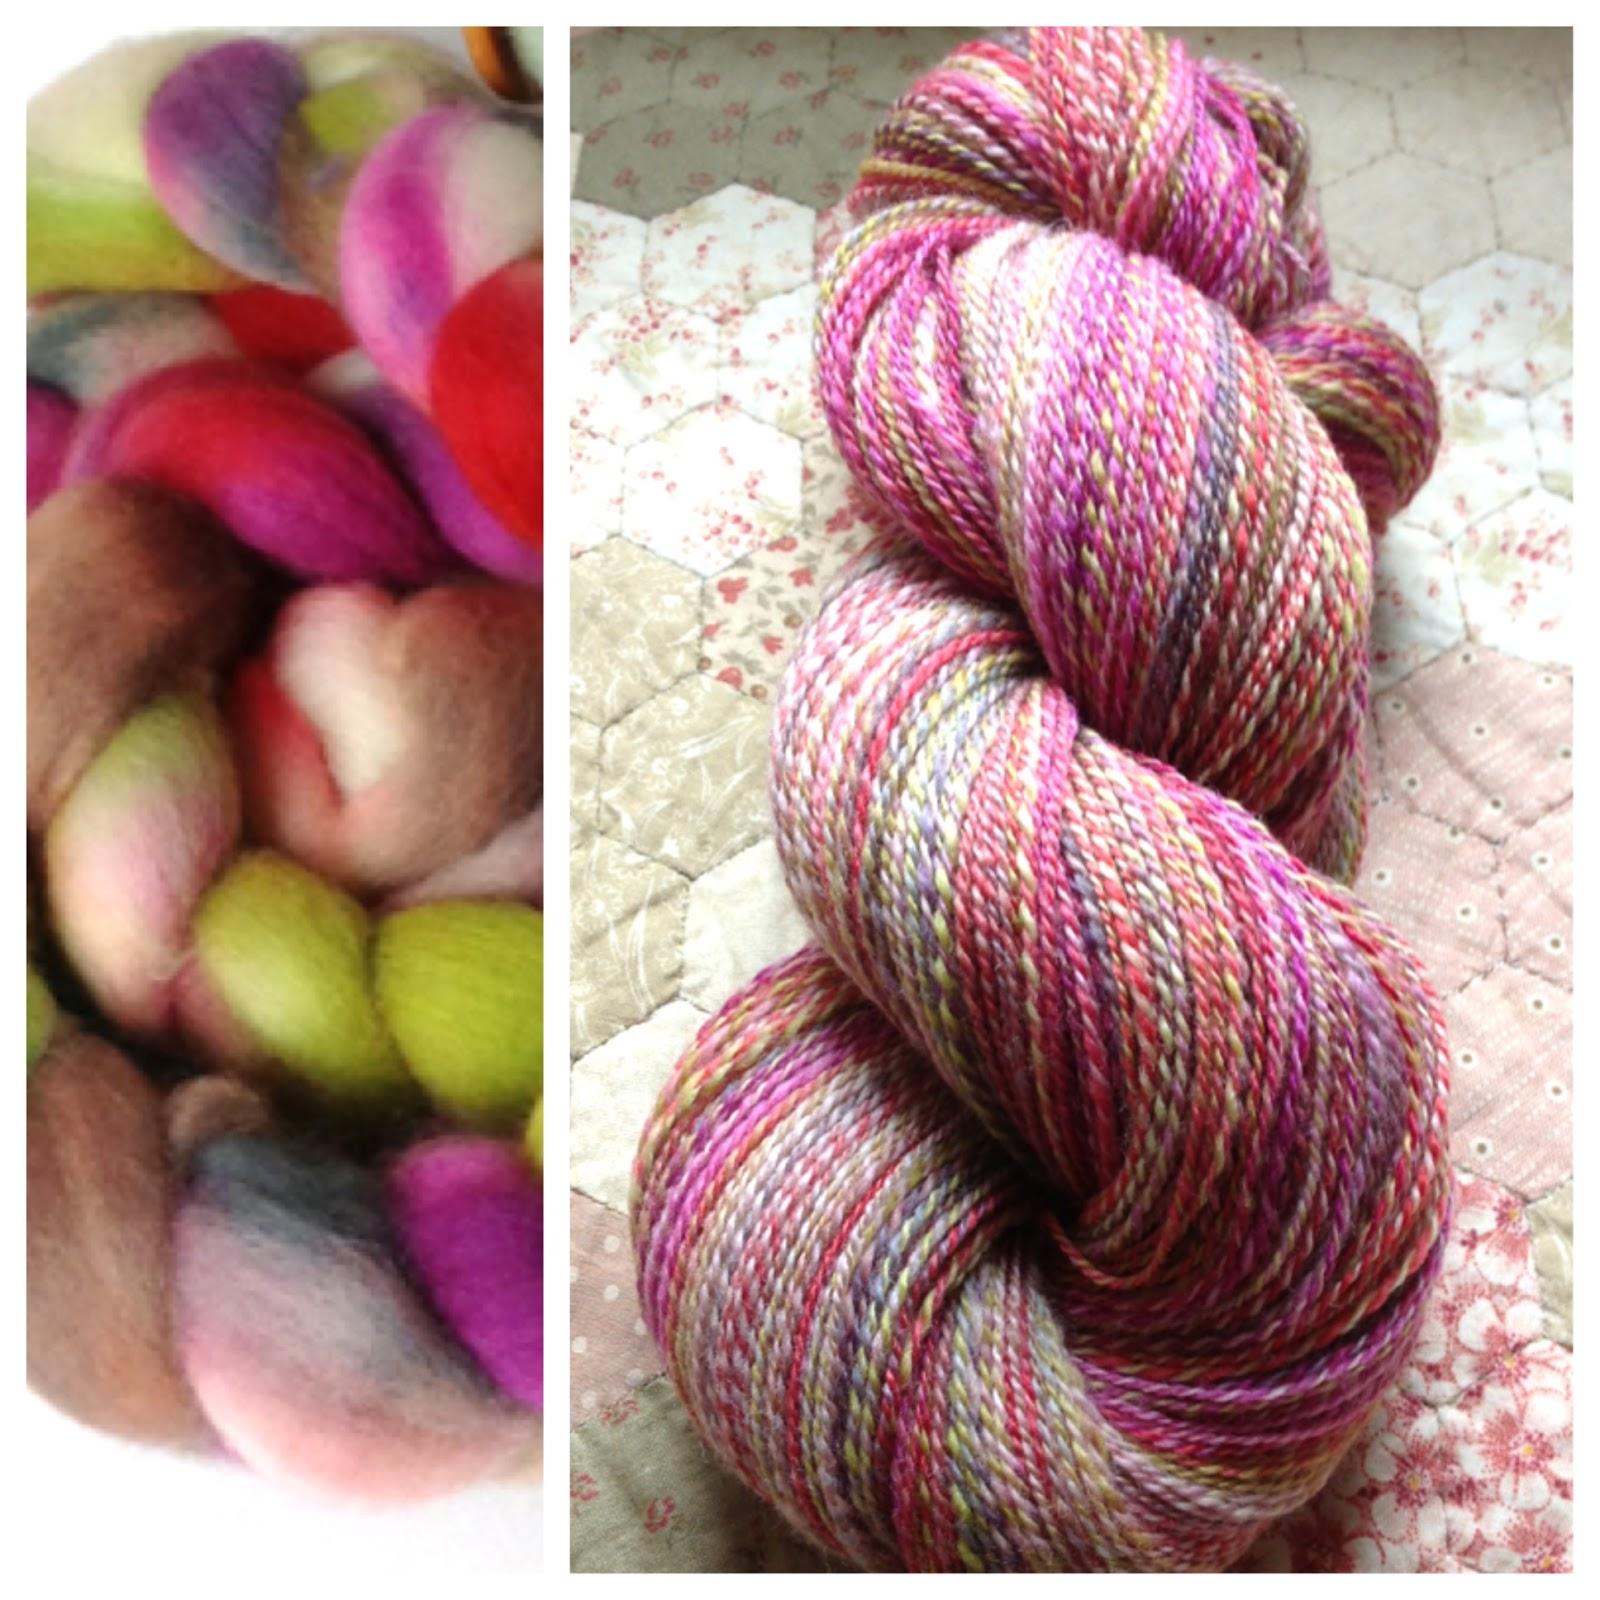 Knitting Handspun Yarn : Littlebobbins knitting with handspun